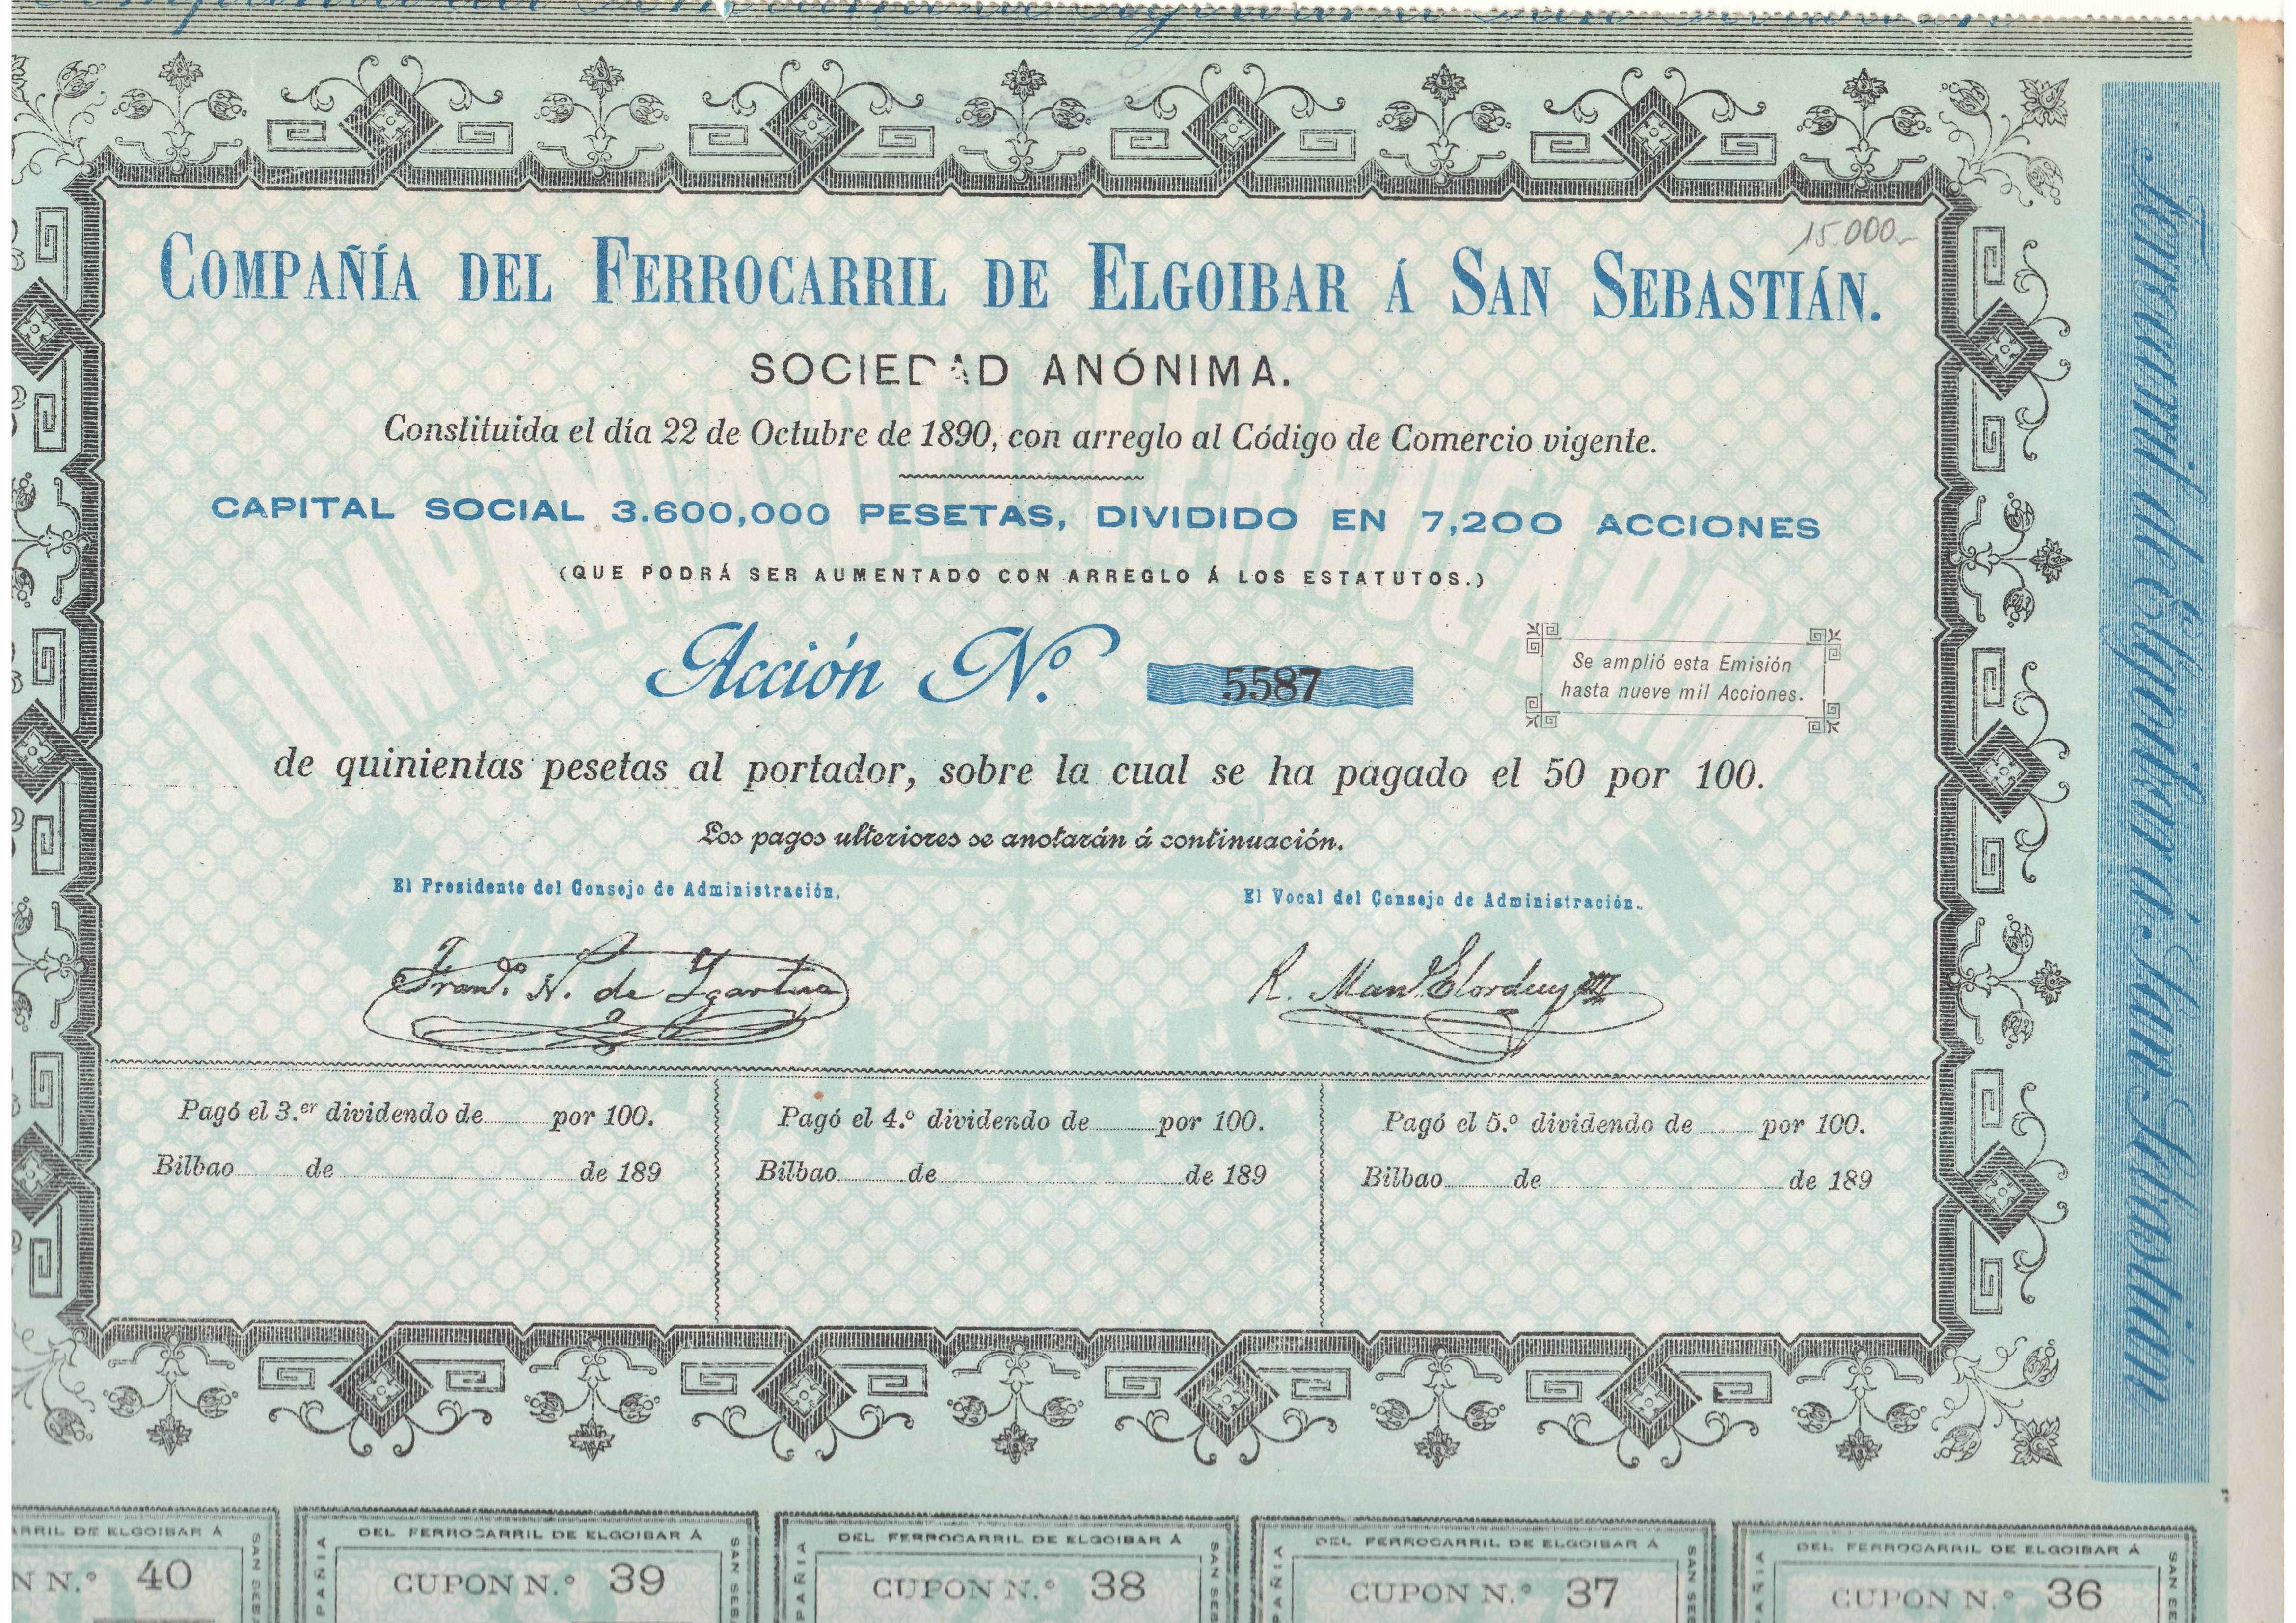 Compañía del Ferrocarril de Elgoibar a San Sebastián